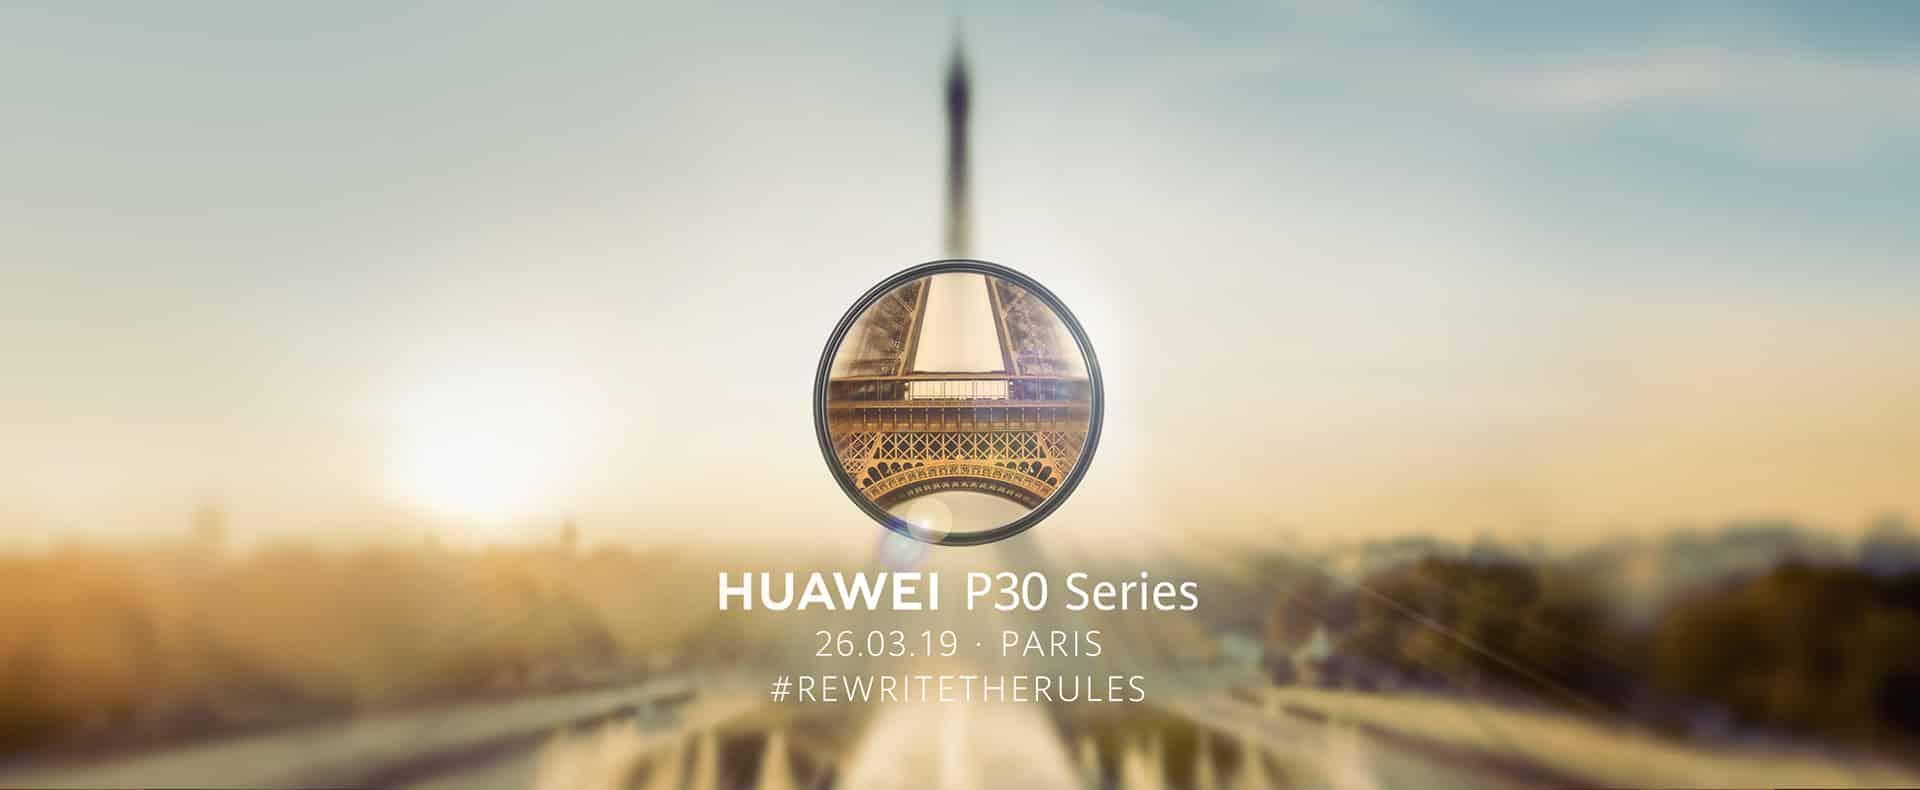 HUAWEI P30 Series Live Stream - เปิดตัว Huawei P30 Series วันที่ 26 มีนาคมนี้ 2 ทุ่มตามเวลาไทย